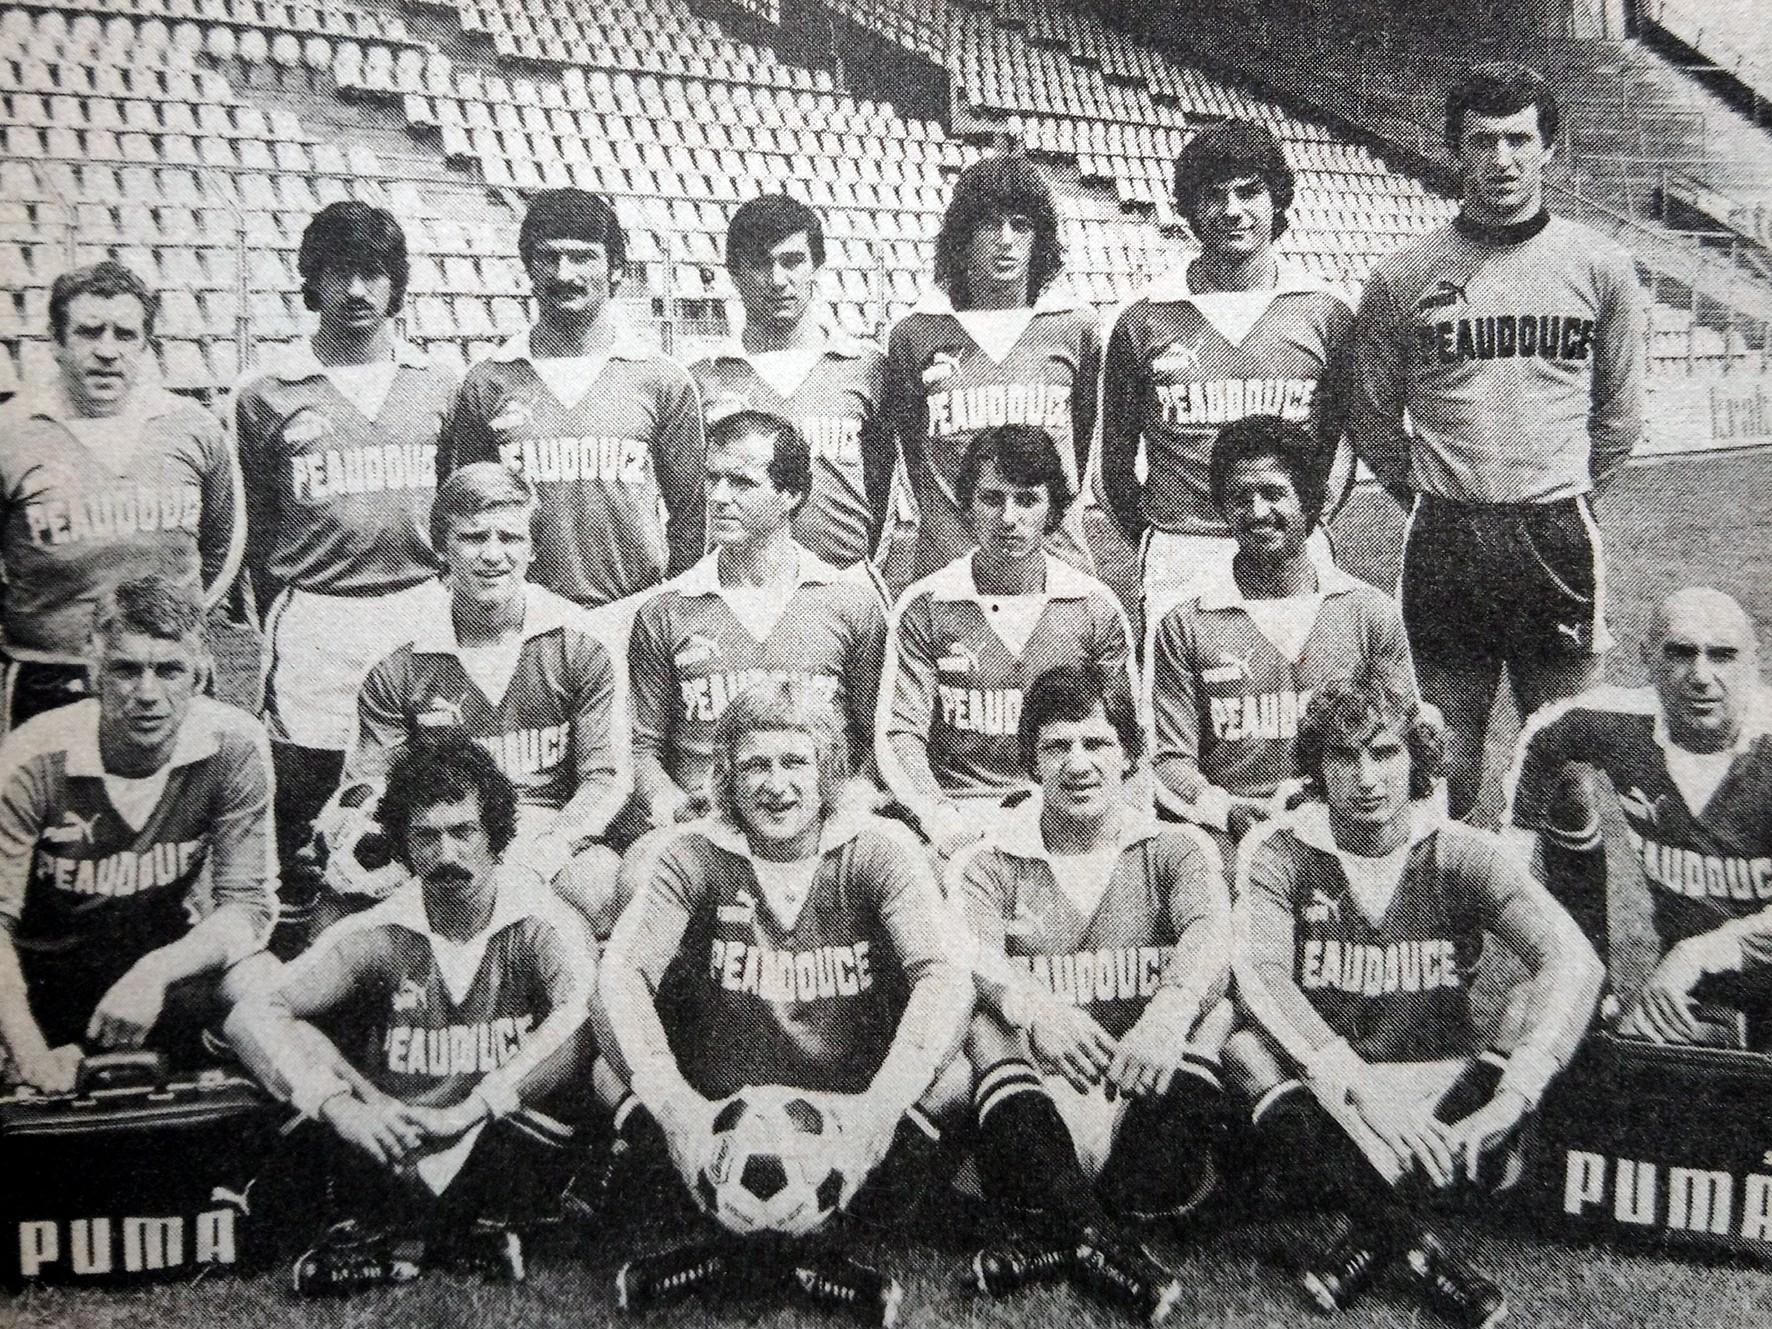 Le maillot Peaudouce LOSC 1979 un maillot classic du football !